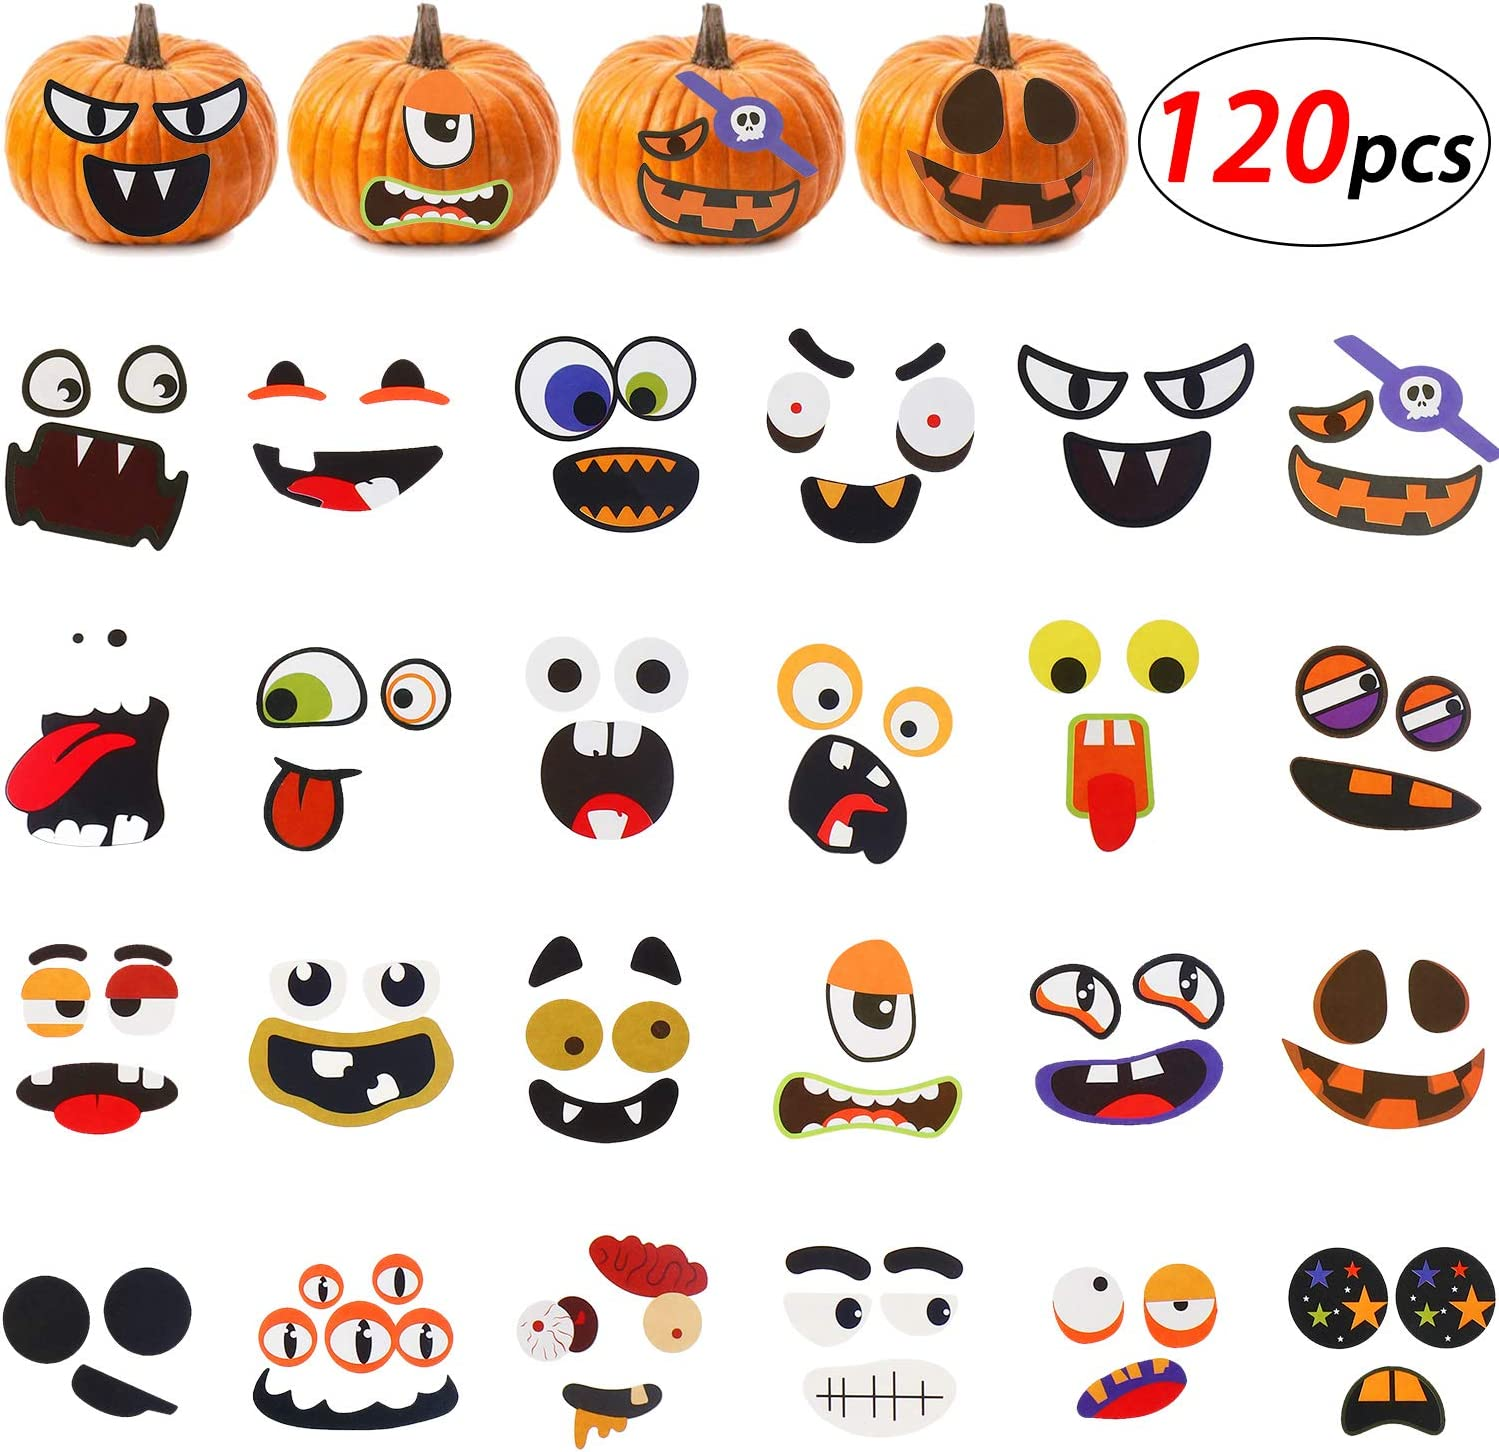 Pumpkin Emoji Craft Kit for kids Children Large Self Adhesive 3D Pumpkin Face Decorating Stickers Craft for Parties Activities-16 Pack Halloween Foam Pumpkin Decoration Stickers Craft Kit